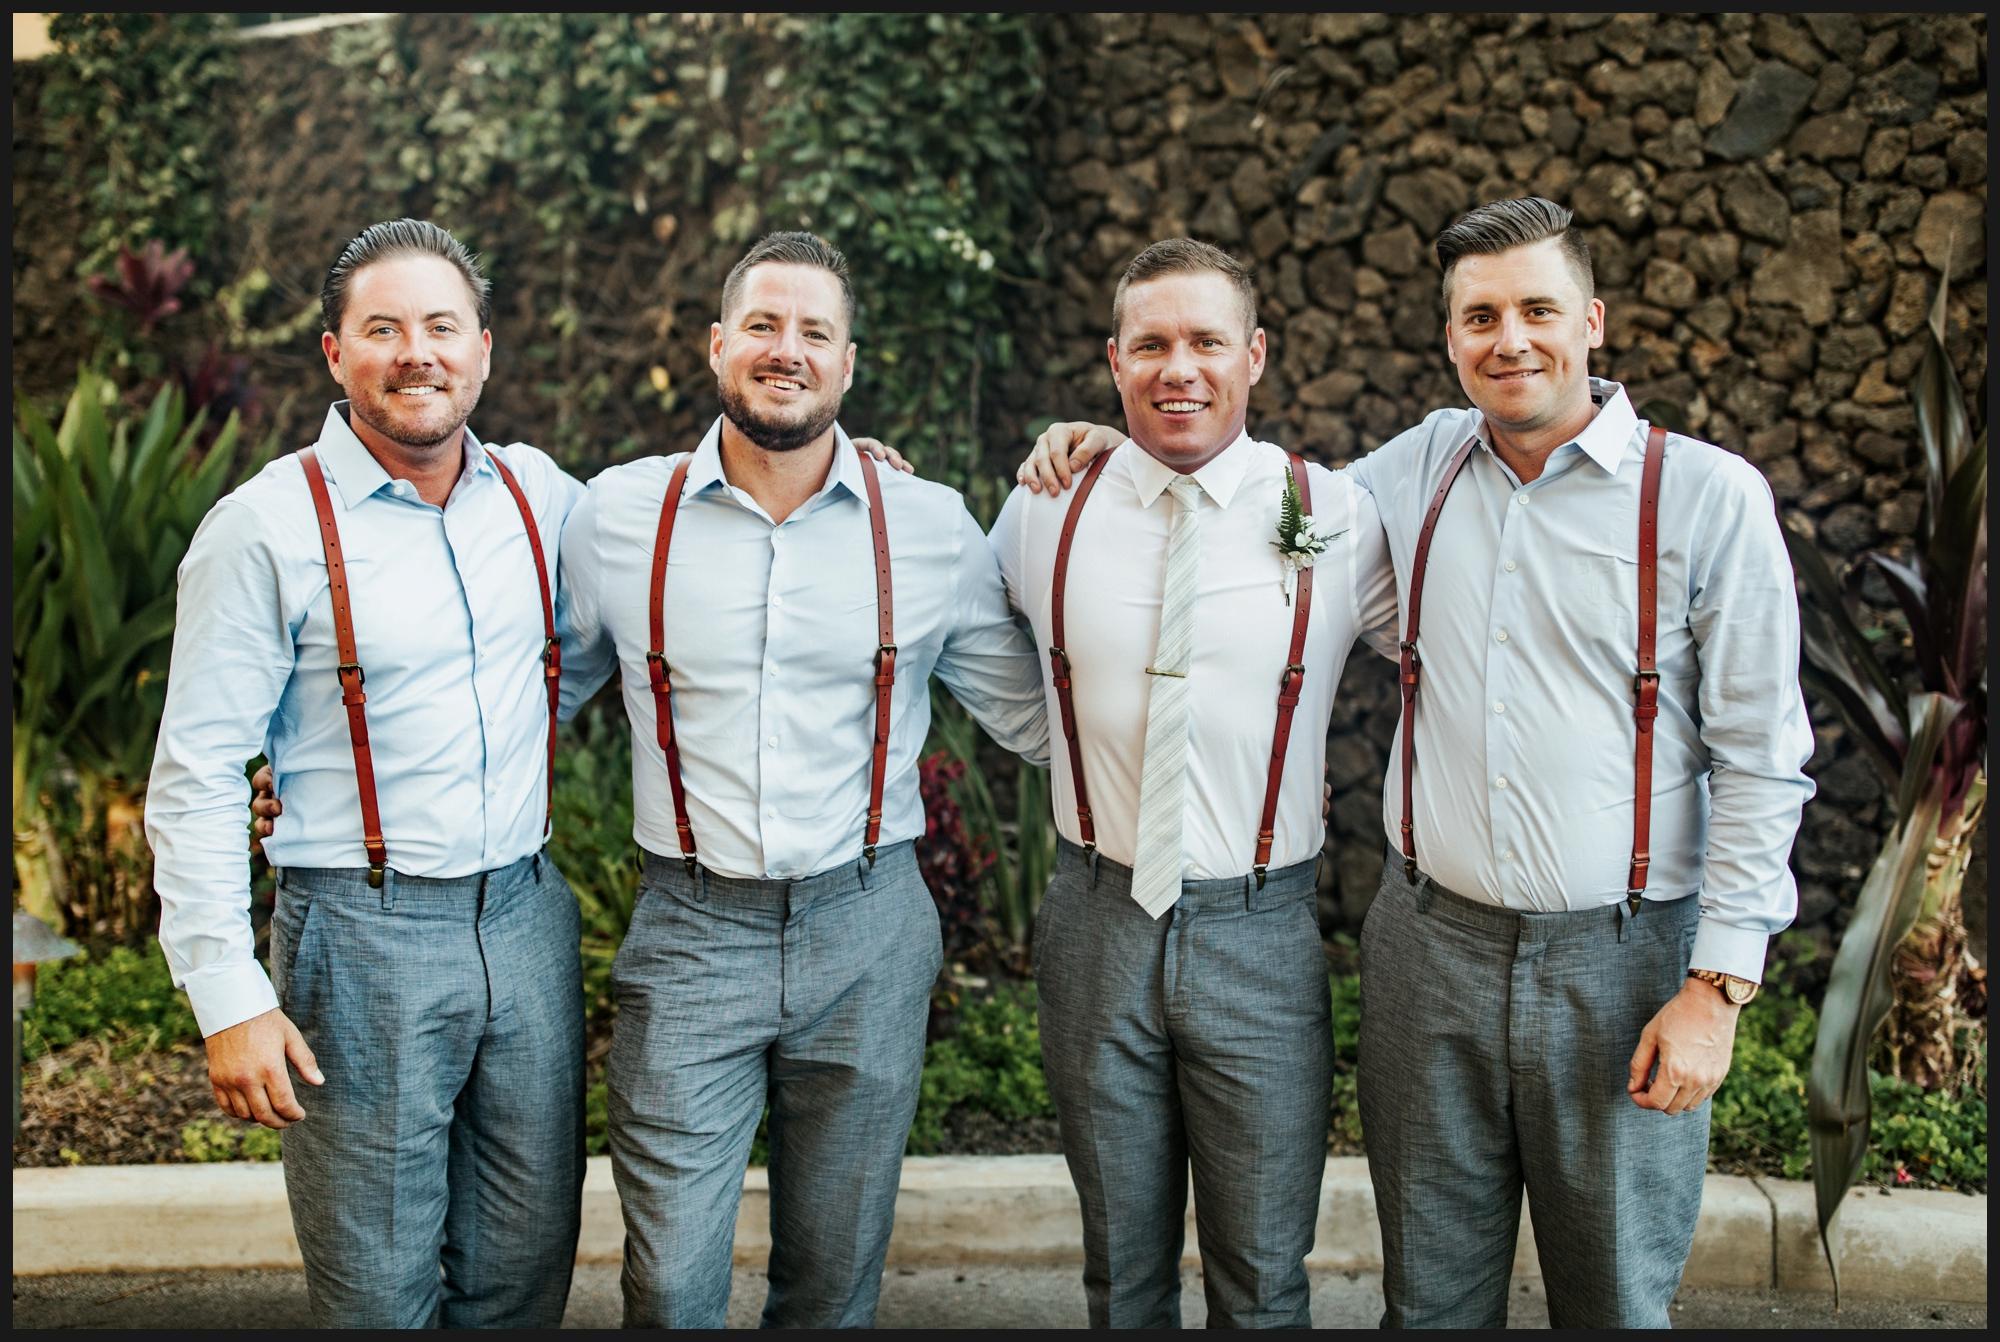 Orlando-Wedding-Photographer-destination-wedding-photographer-florida-wedding-photographer-hawaii-wedding-photographer_0072.jpg